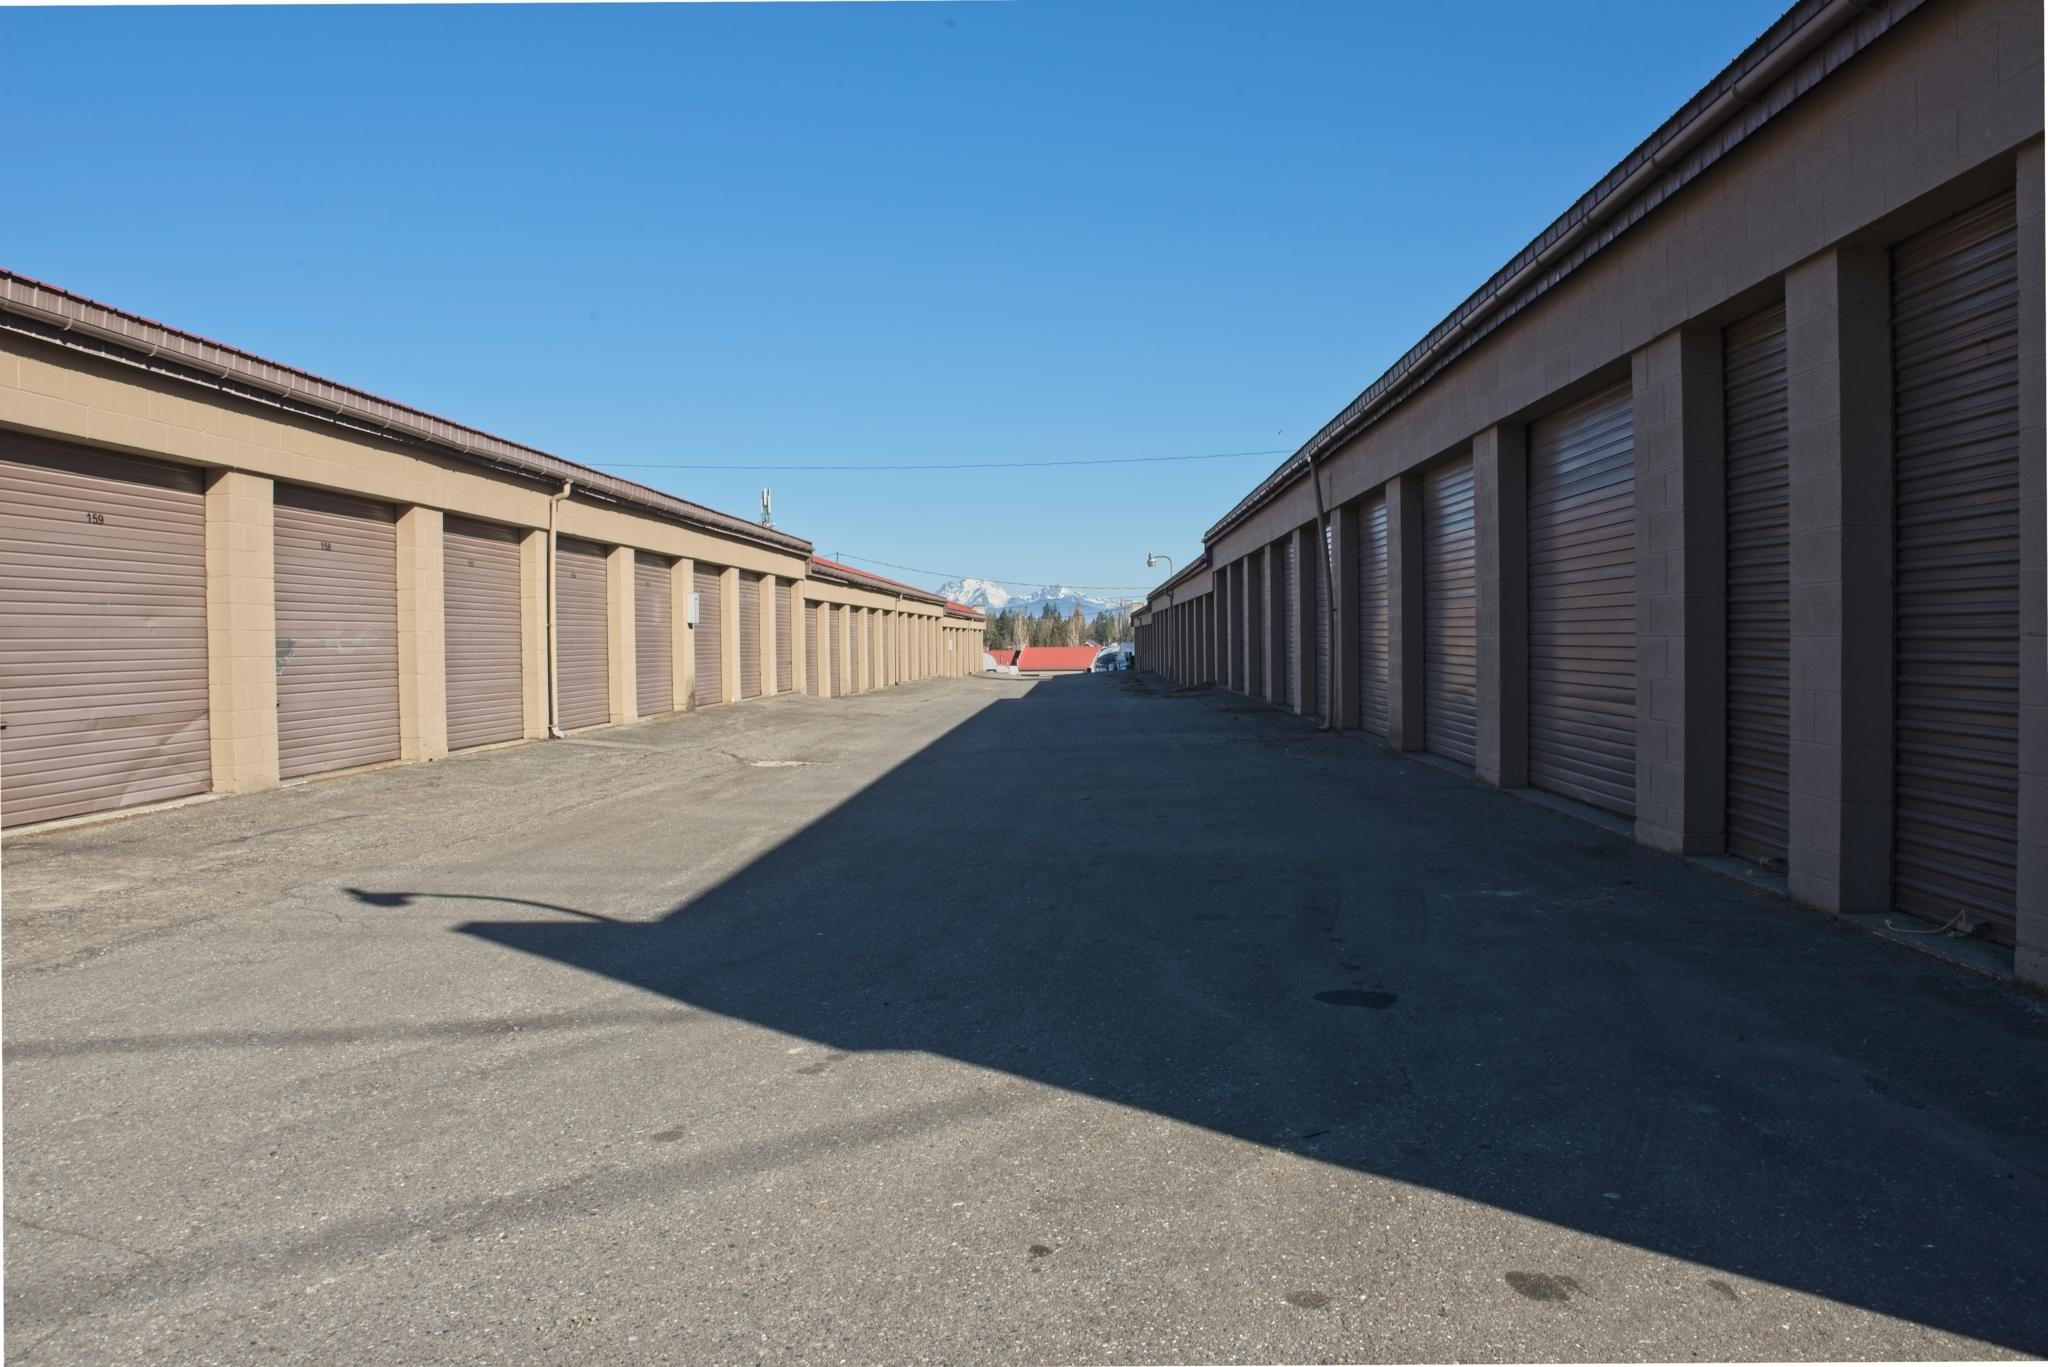 Pacific Mini Storage & Warehousing in Abbotsford